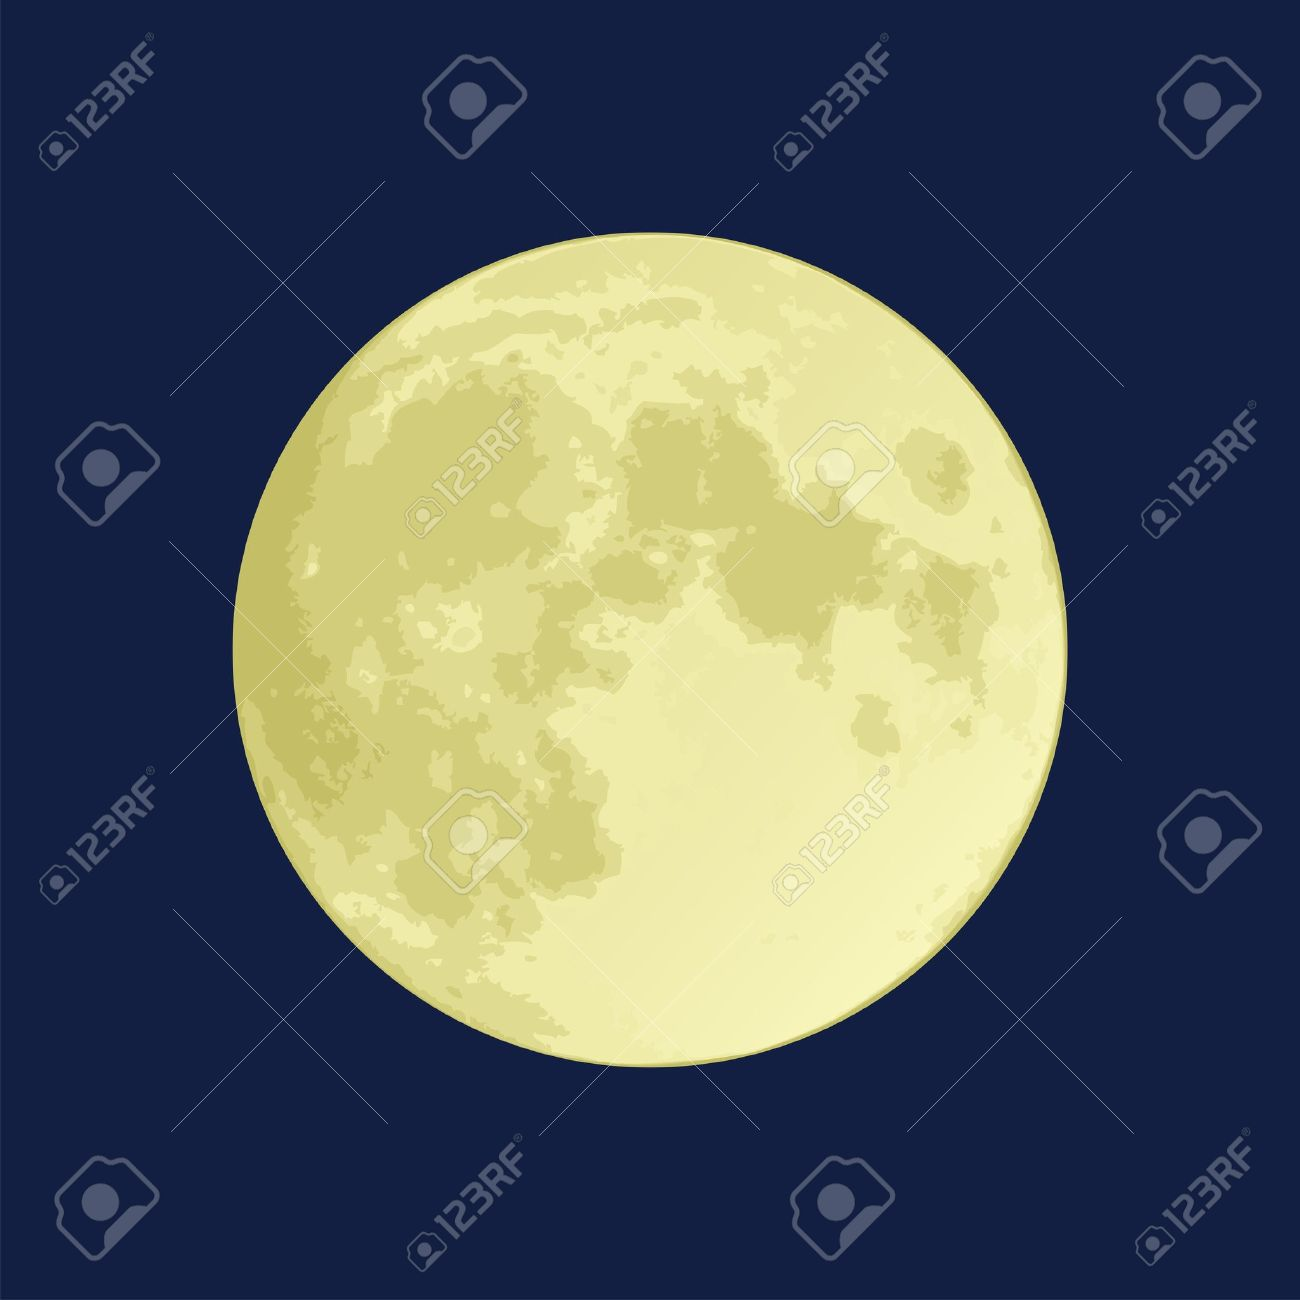 Illustration of a full moon on a dark blue sky Stock Vector - 9851157